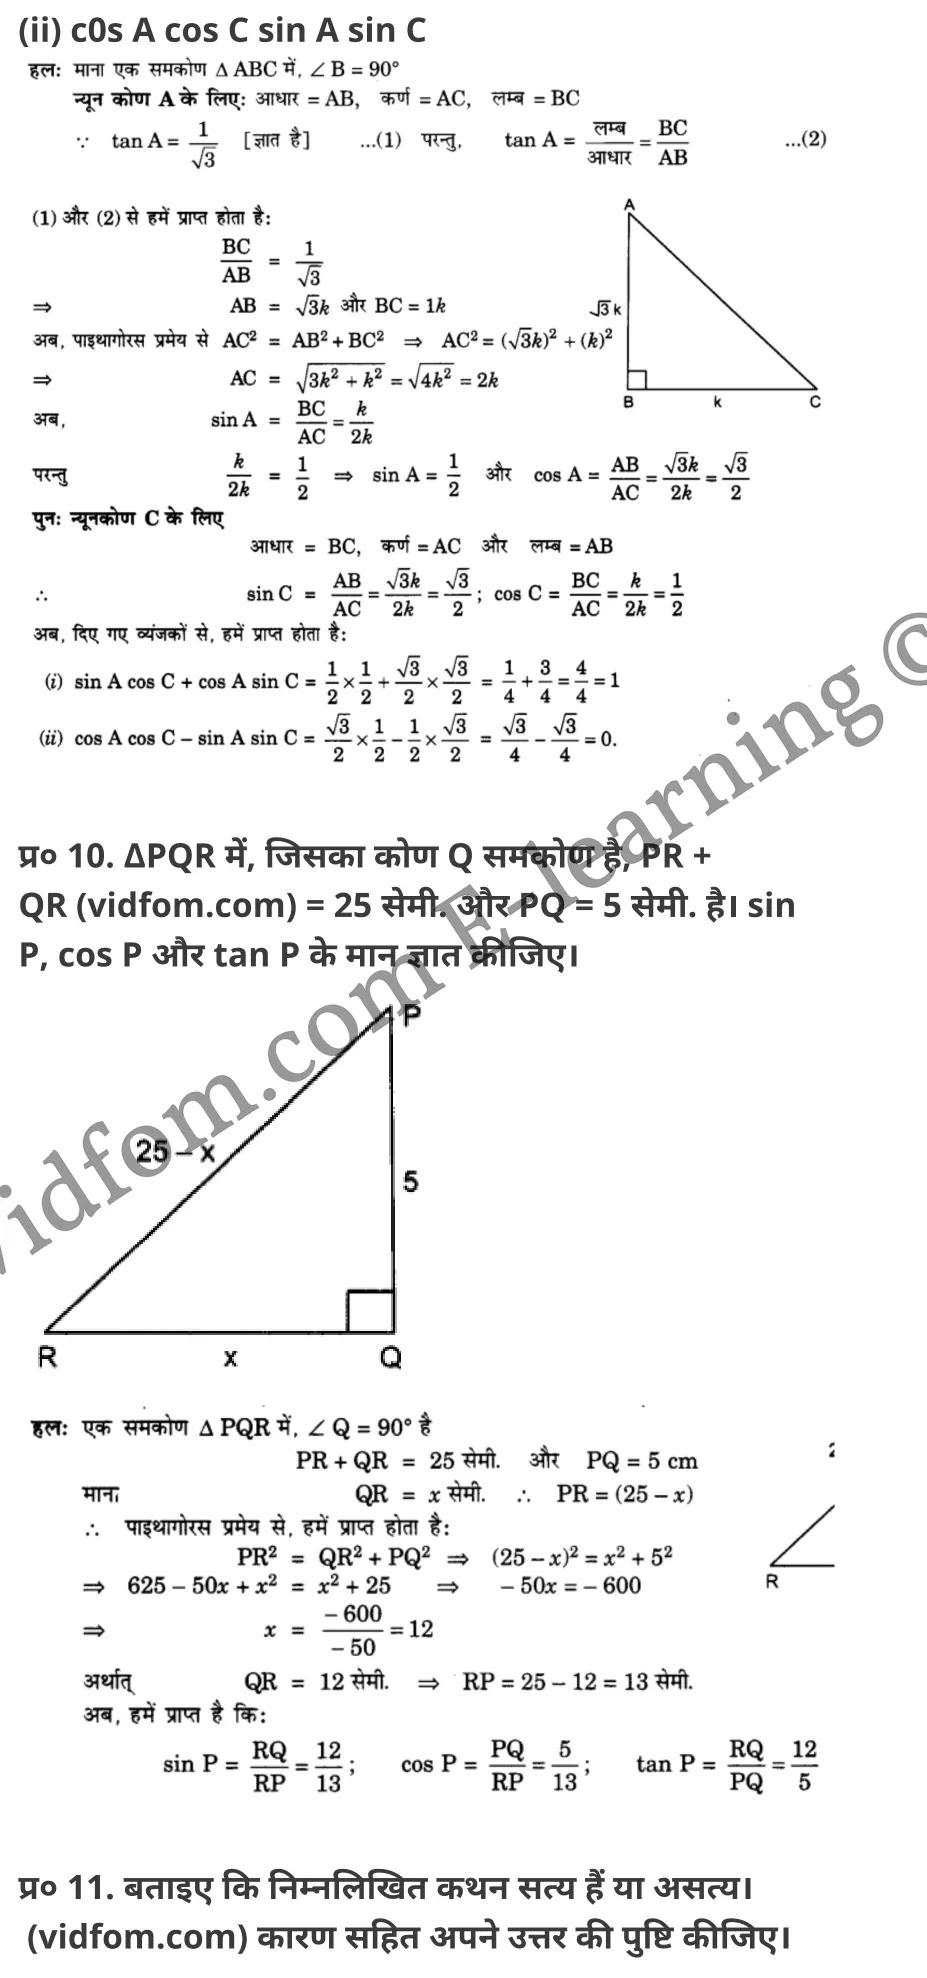 यूपी बोर्ड एनसीईआरटी समाधान कक्षा 11 गणित अध्याय 8 Introduction to Trigonometry (त्रिकोणमिति का परिचय) के नोट्स हिंदी में